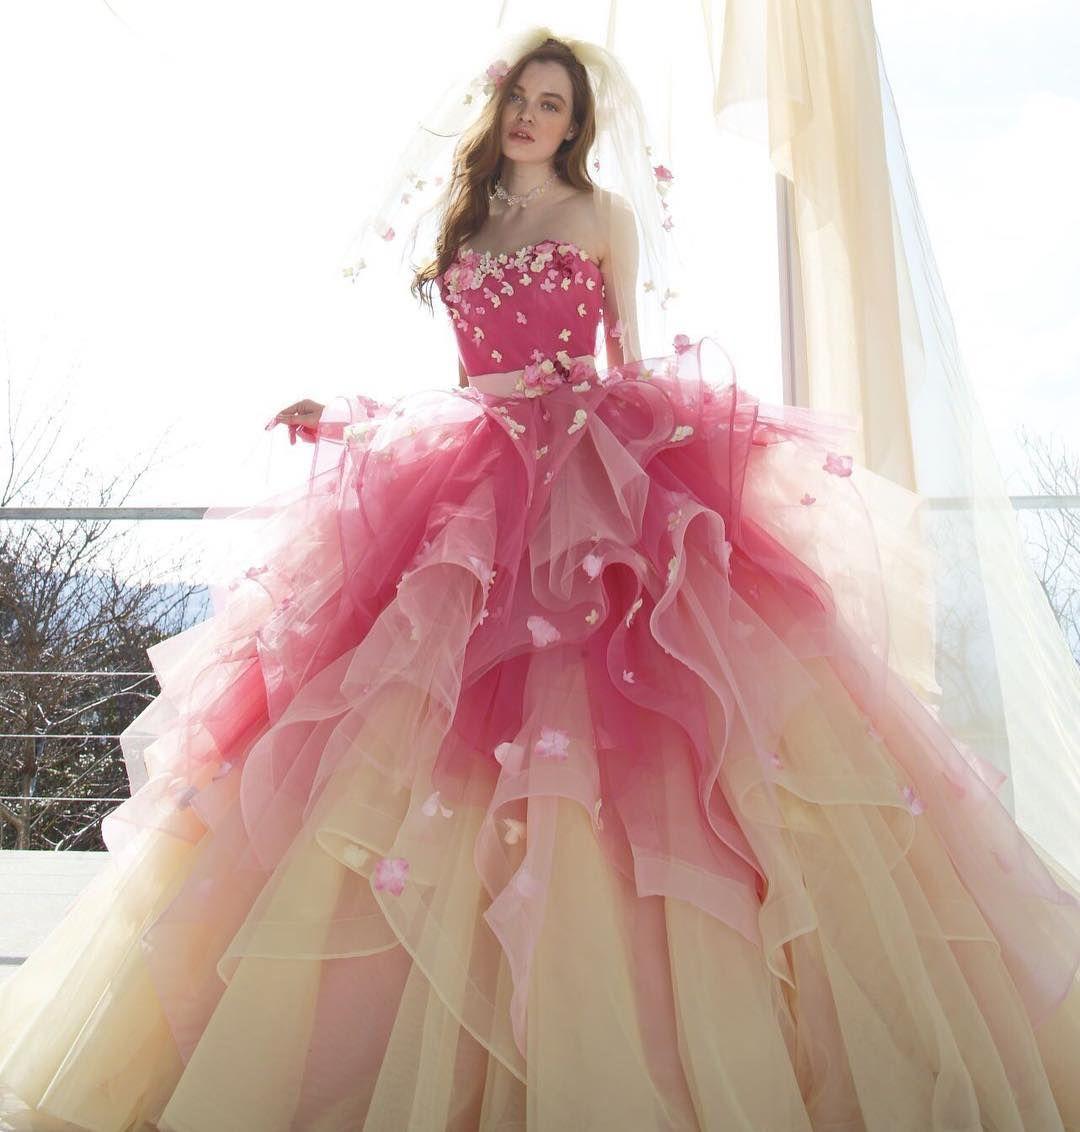 kiyoko_hata | Beautiful dresses | Pinterest | Novios y Vestiditos